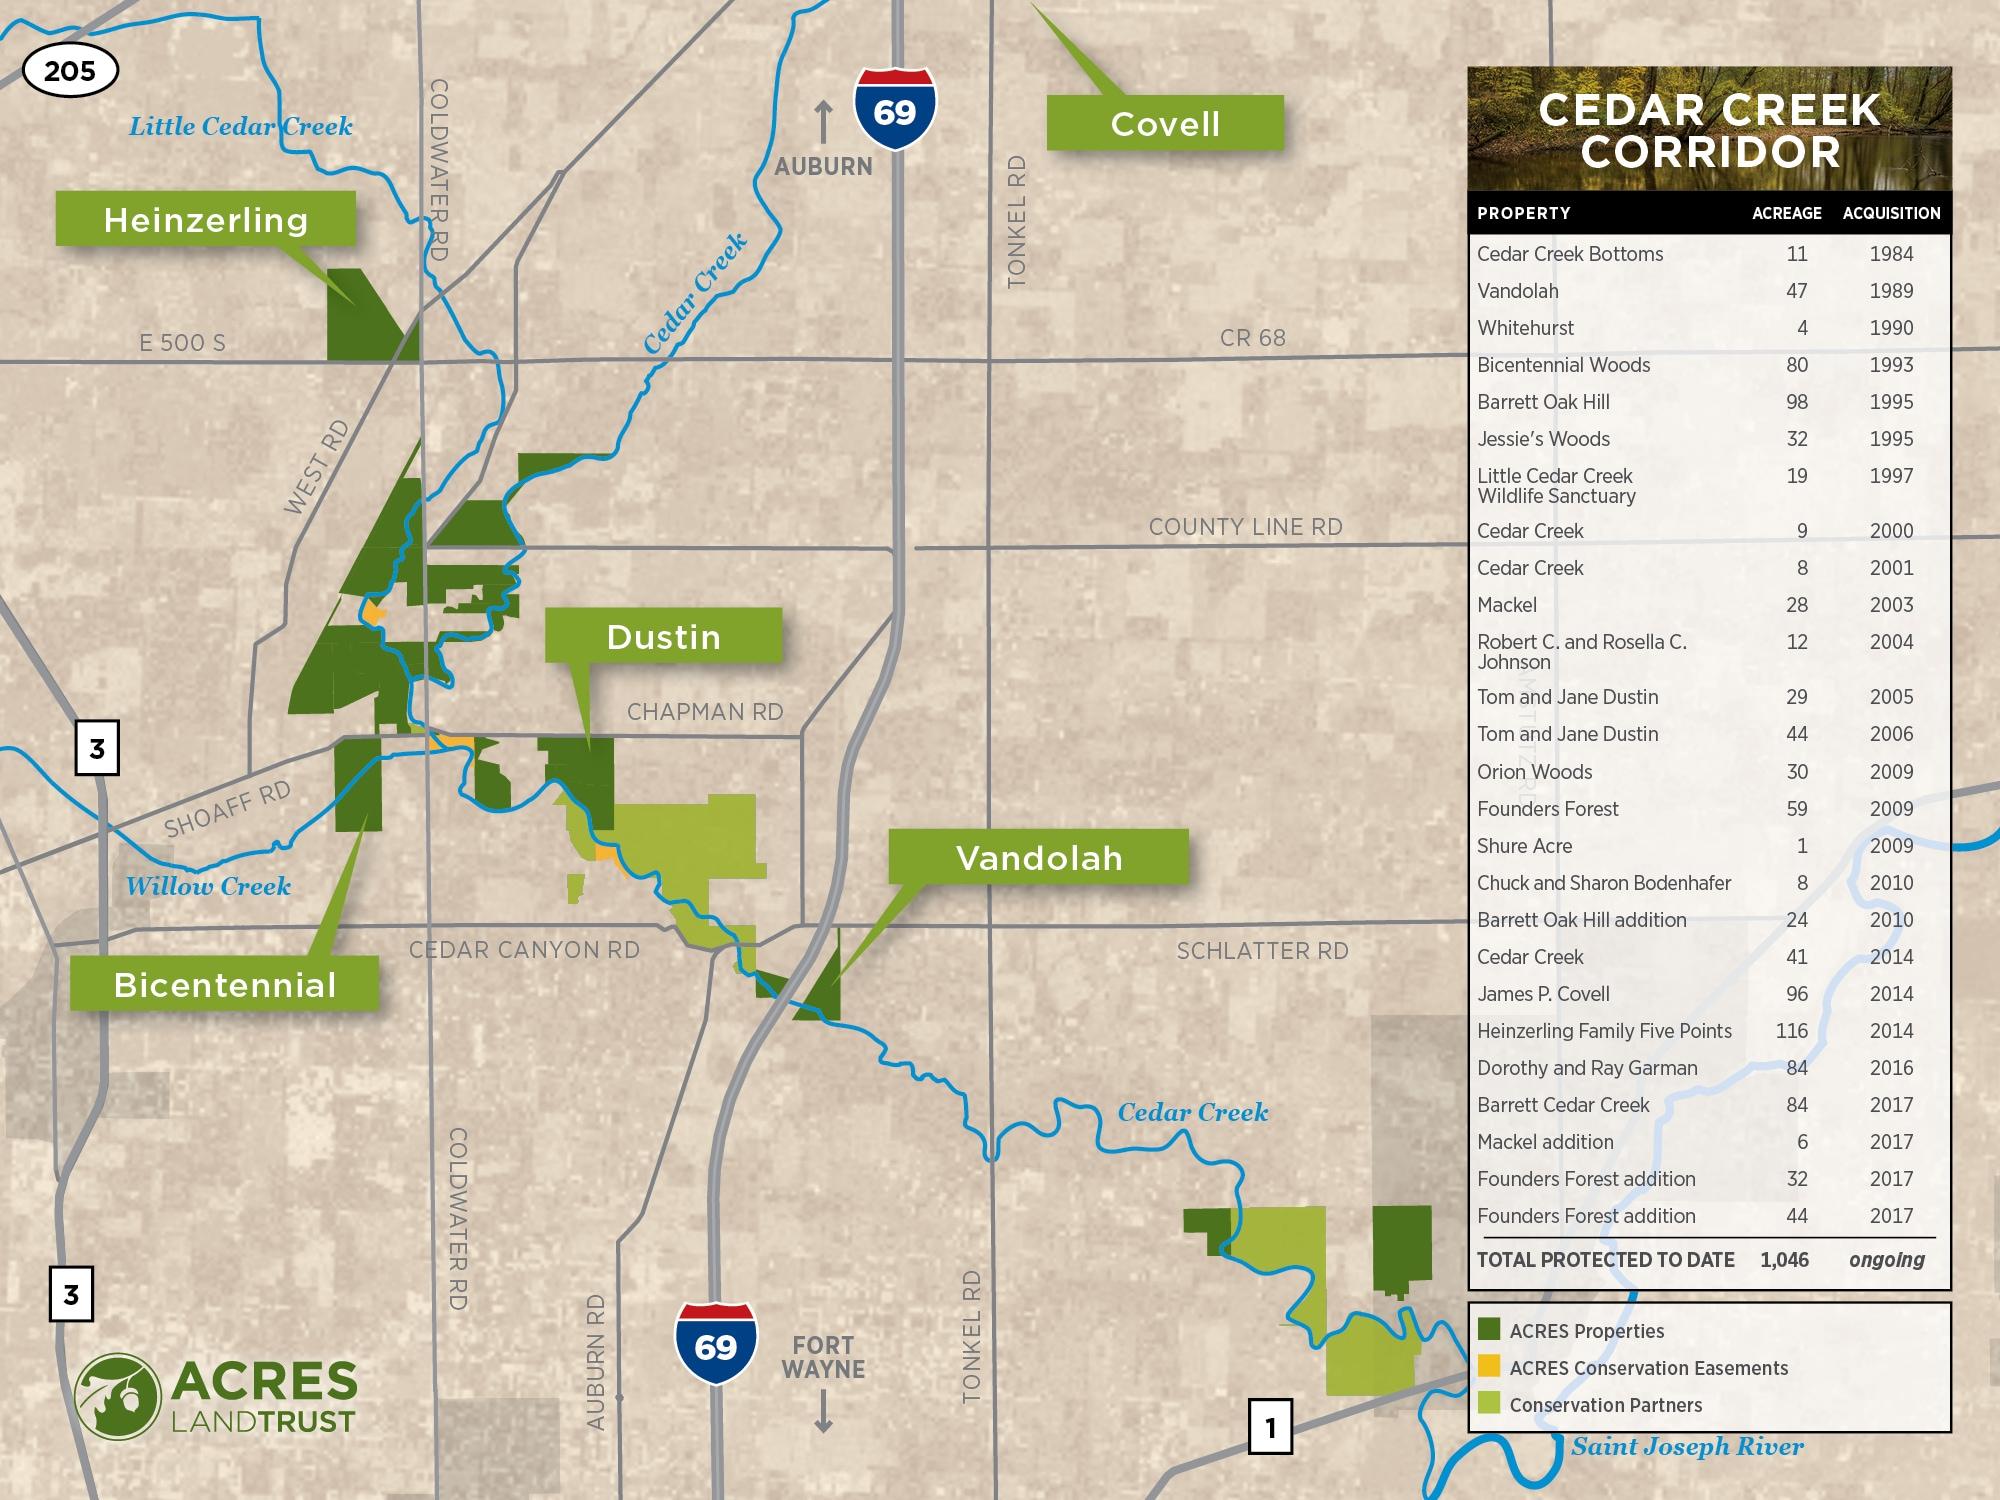 About ACRES & Cedar Creek